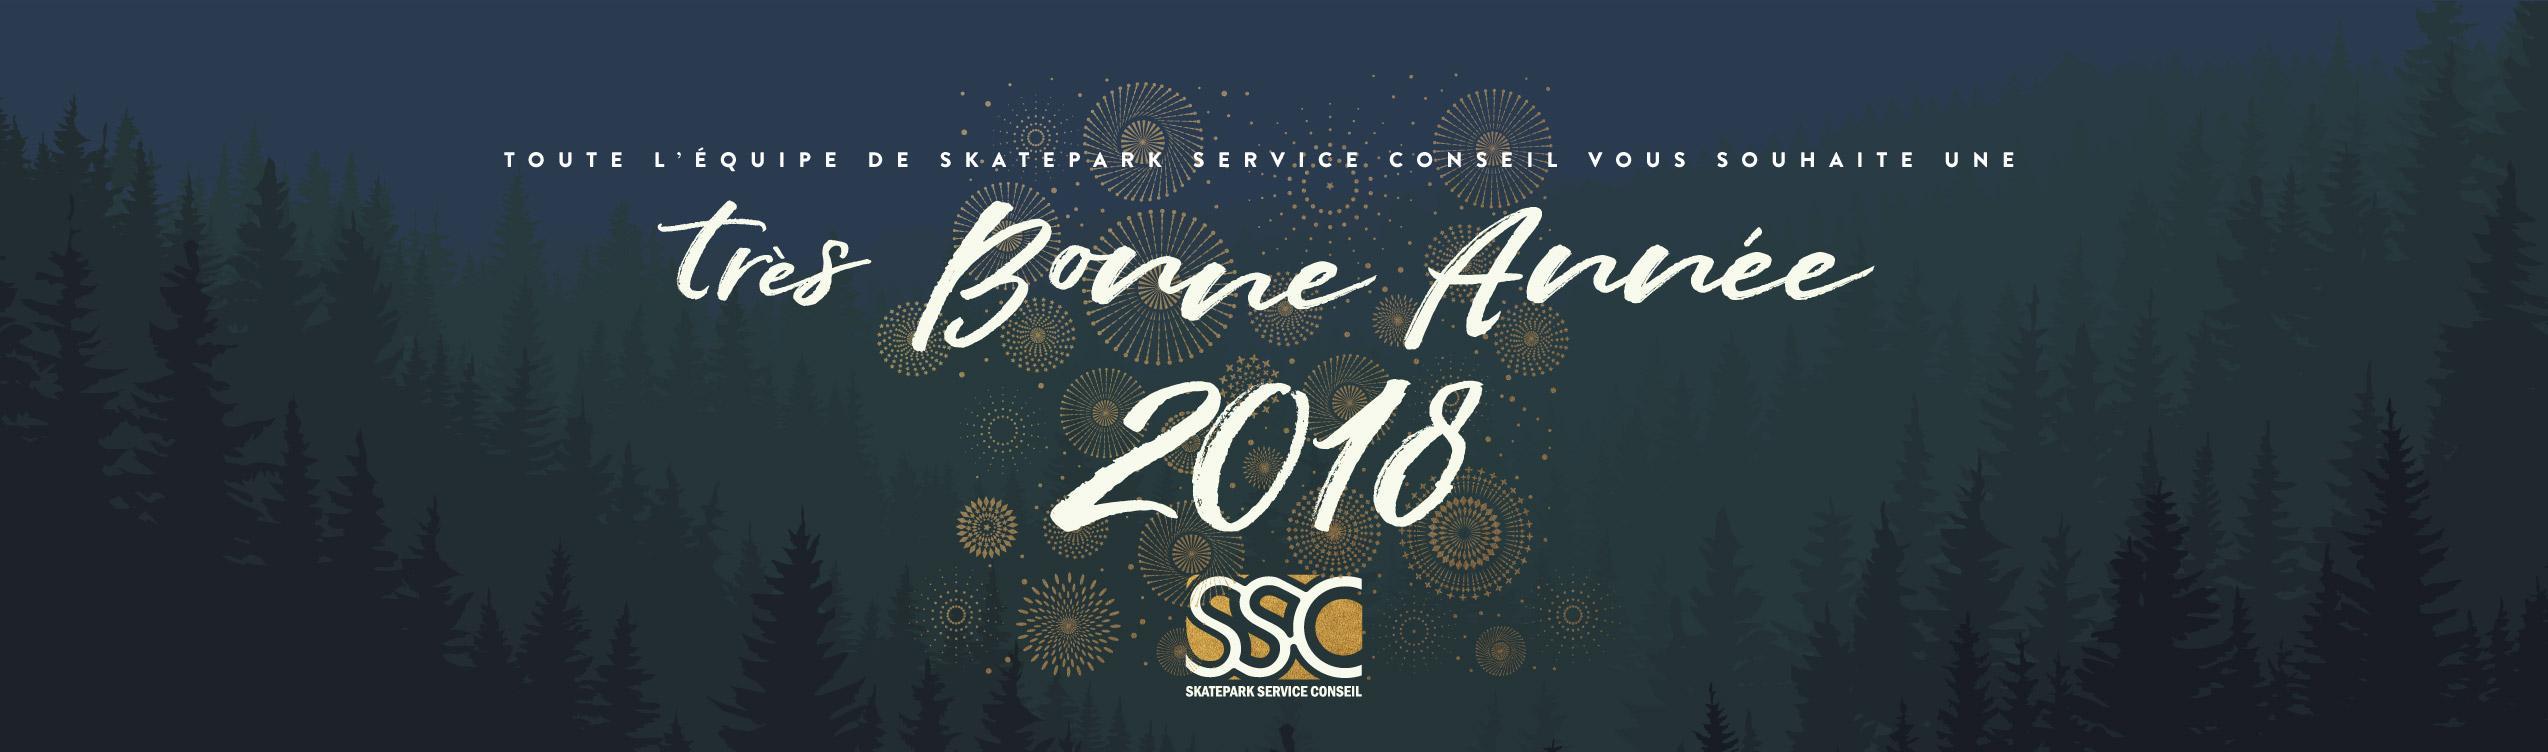 voeux-2018-ssc